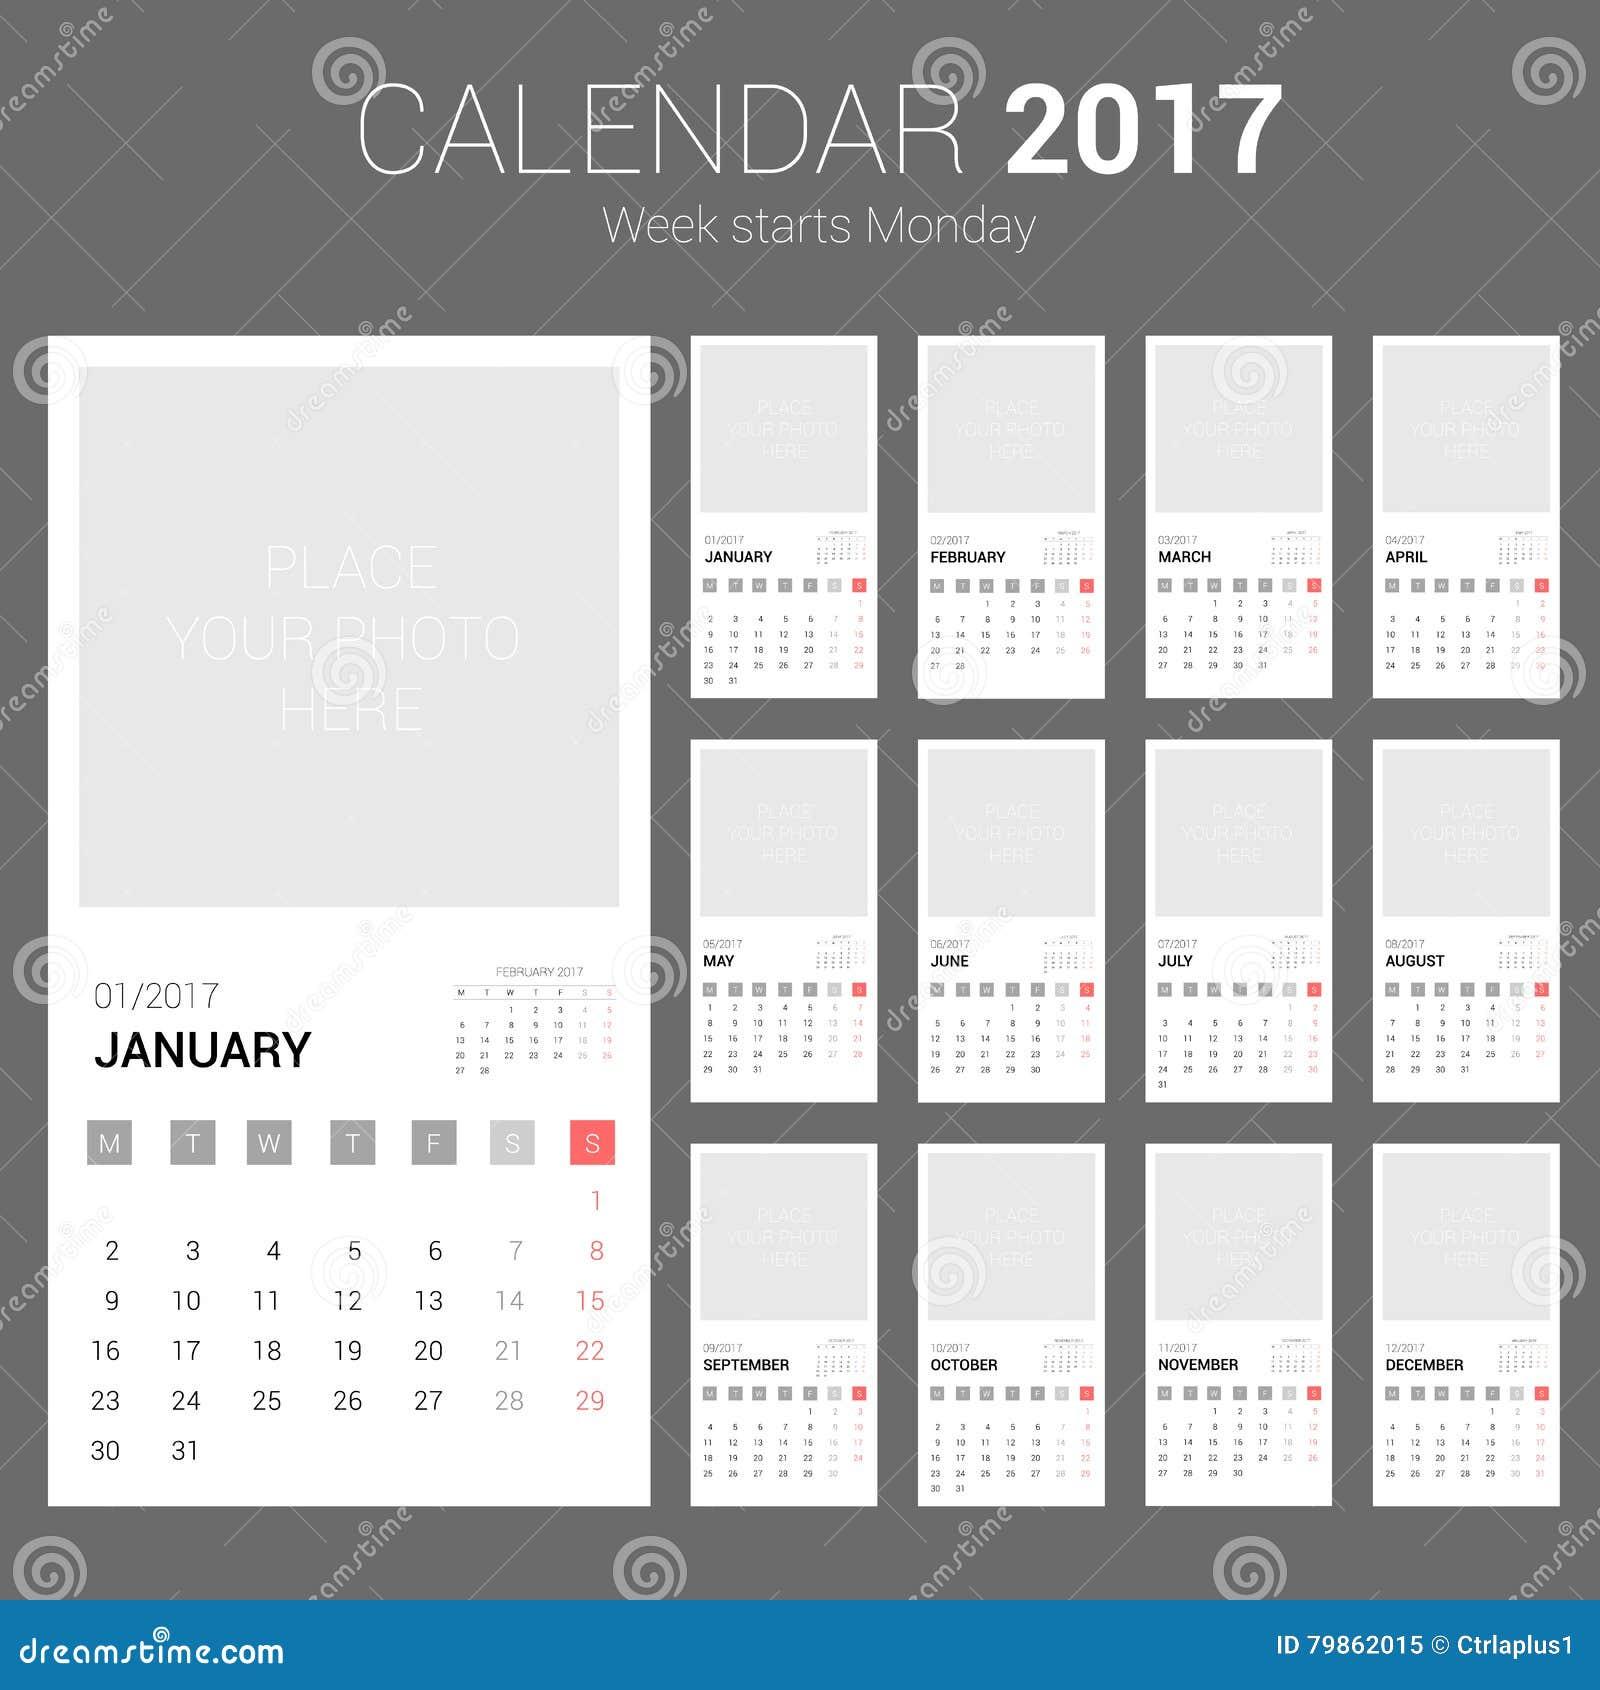 2017 calendar planner design week starts monday stock vector